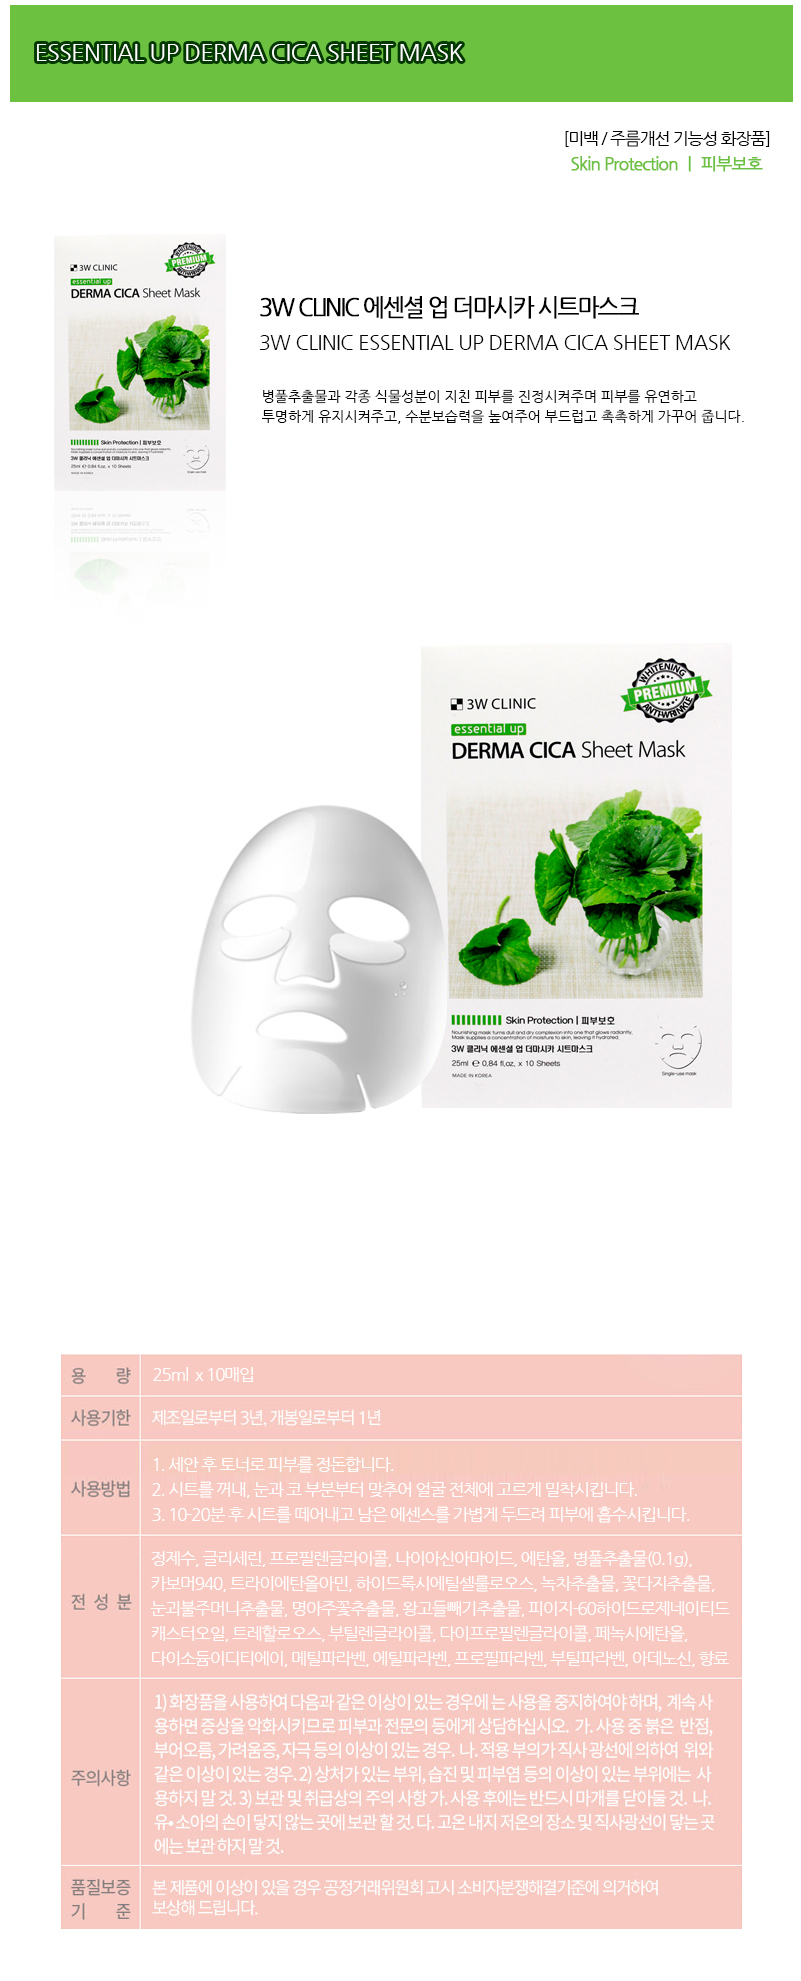 3W-CLINIC-Essential-Up-Derma-Cica-Sheet-Mask-10ea.jpg